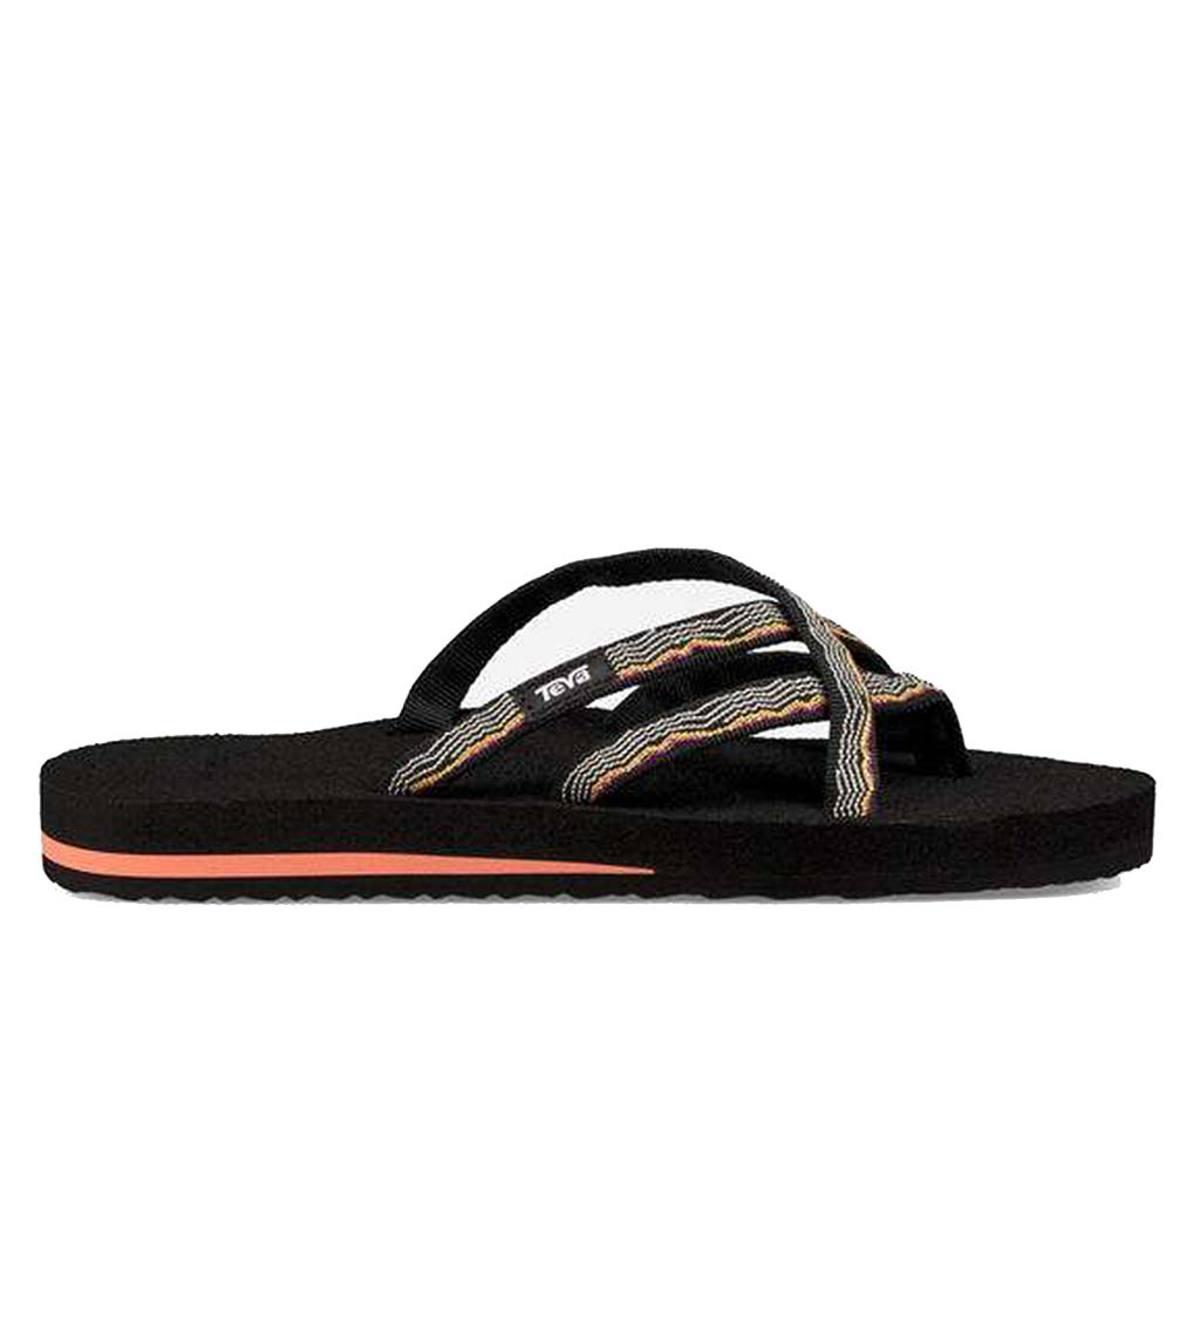 b852e961f Teva Women s Mush Olowahu Flip Flops - Black - Size 6